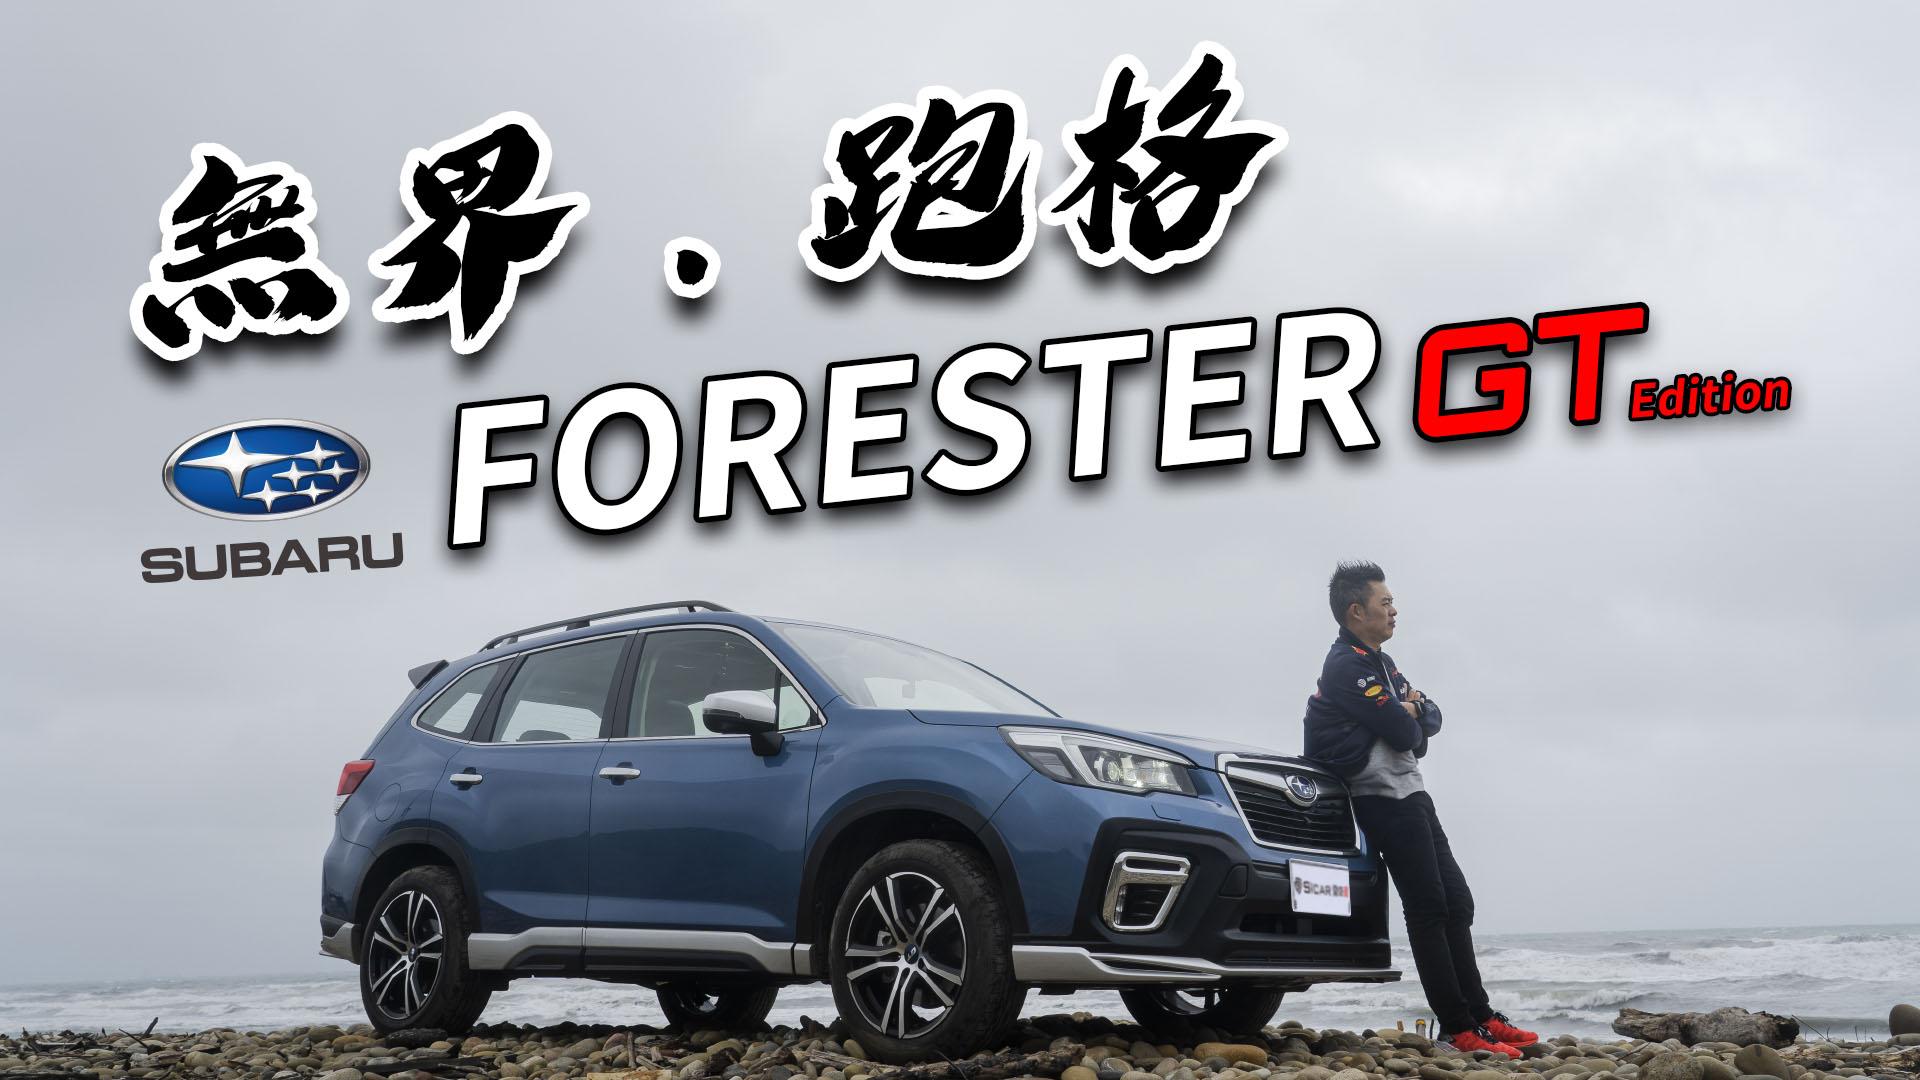 【Andy老爹試駕】全新GT套件 再一次縱橫山林 2020 Forester GT Edition